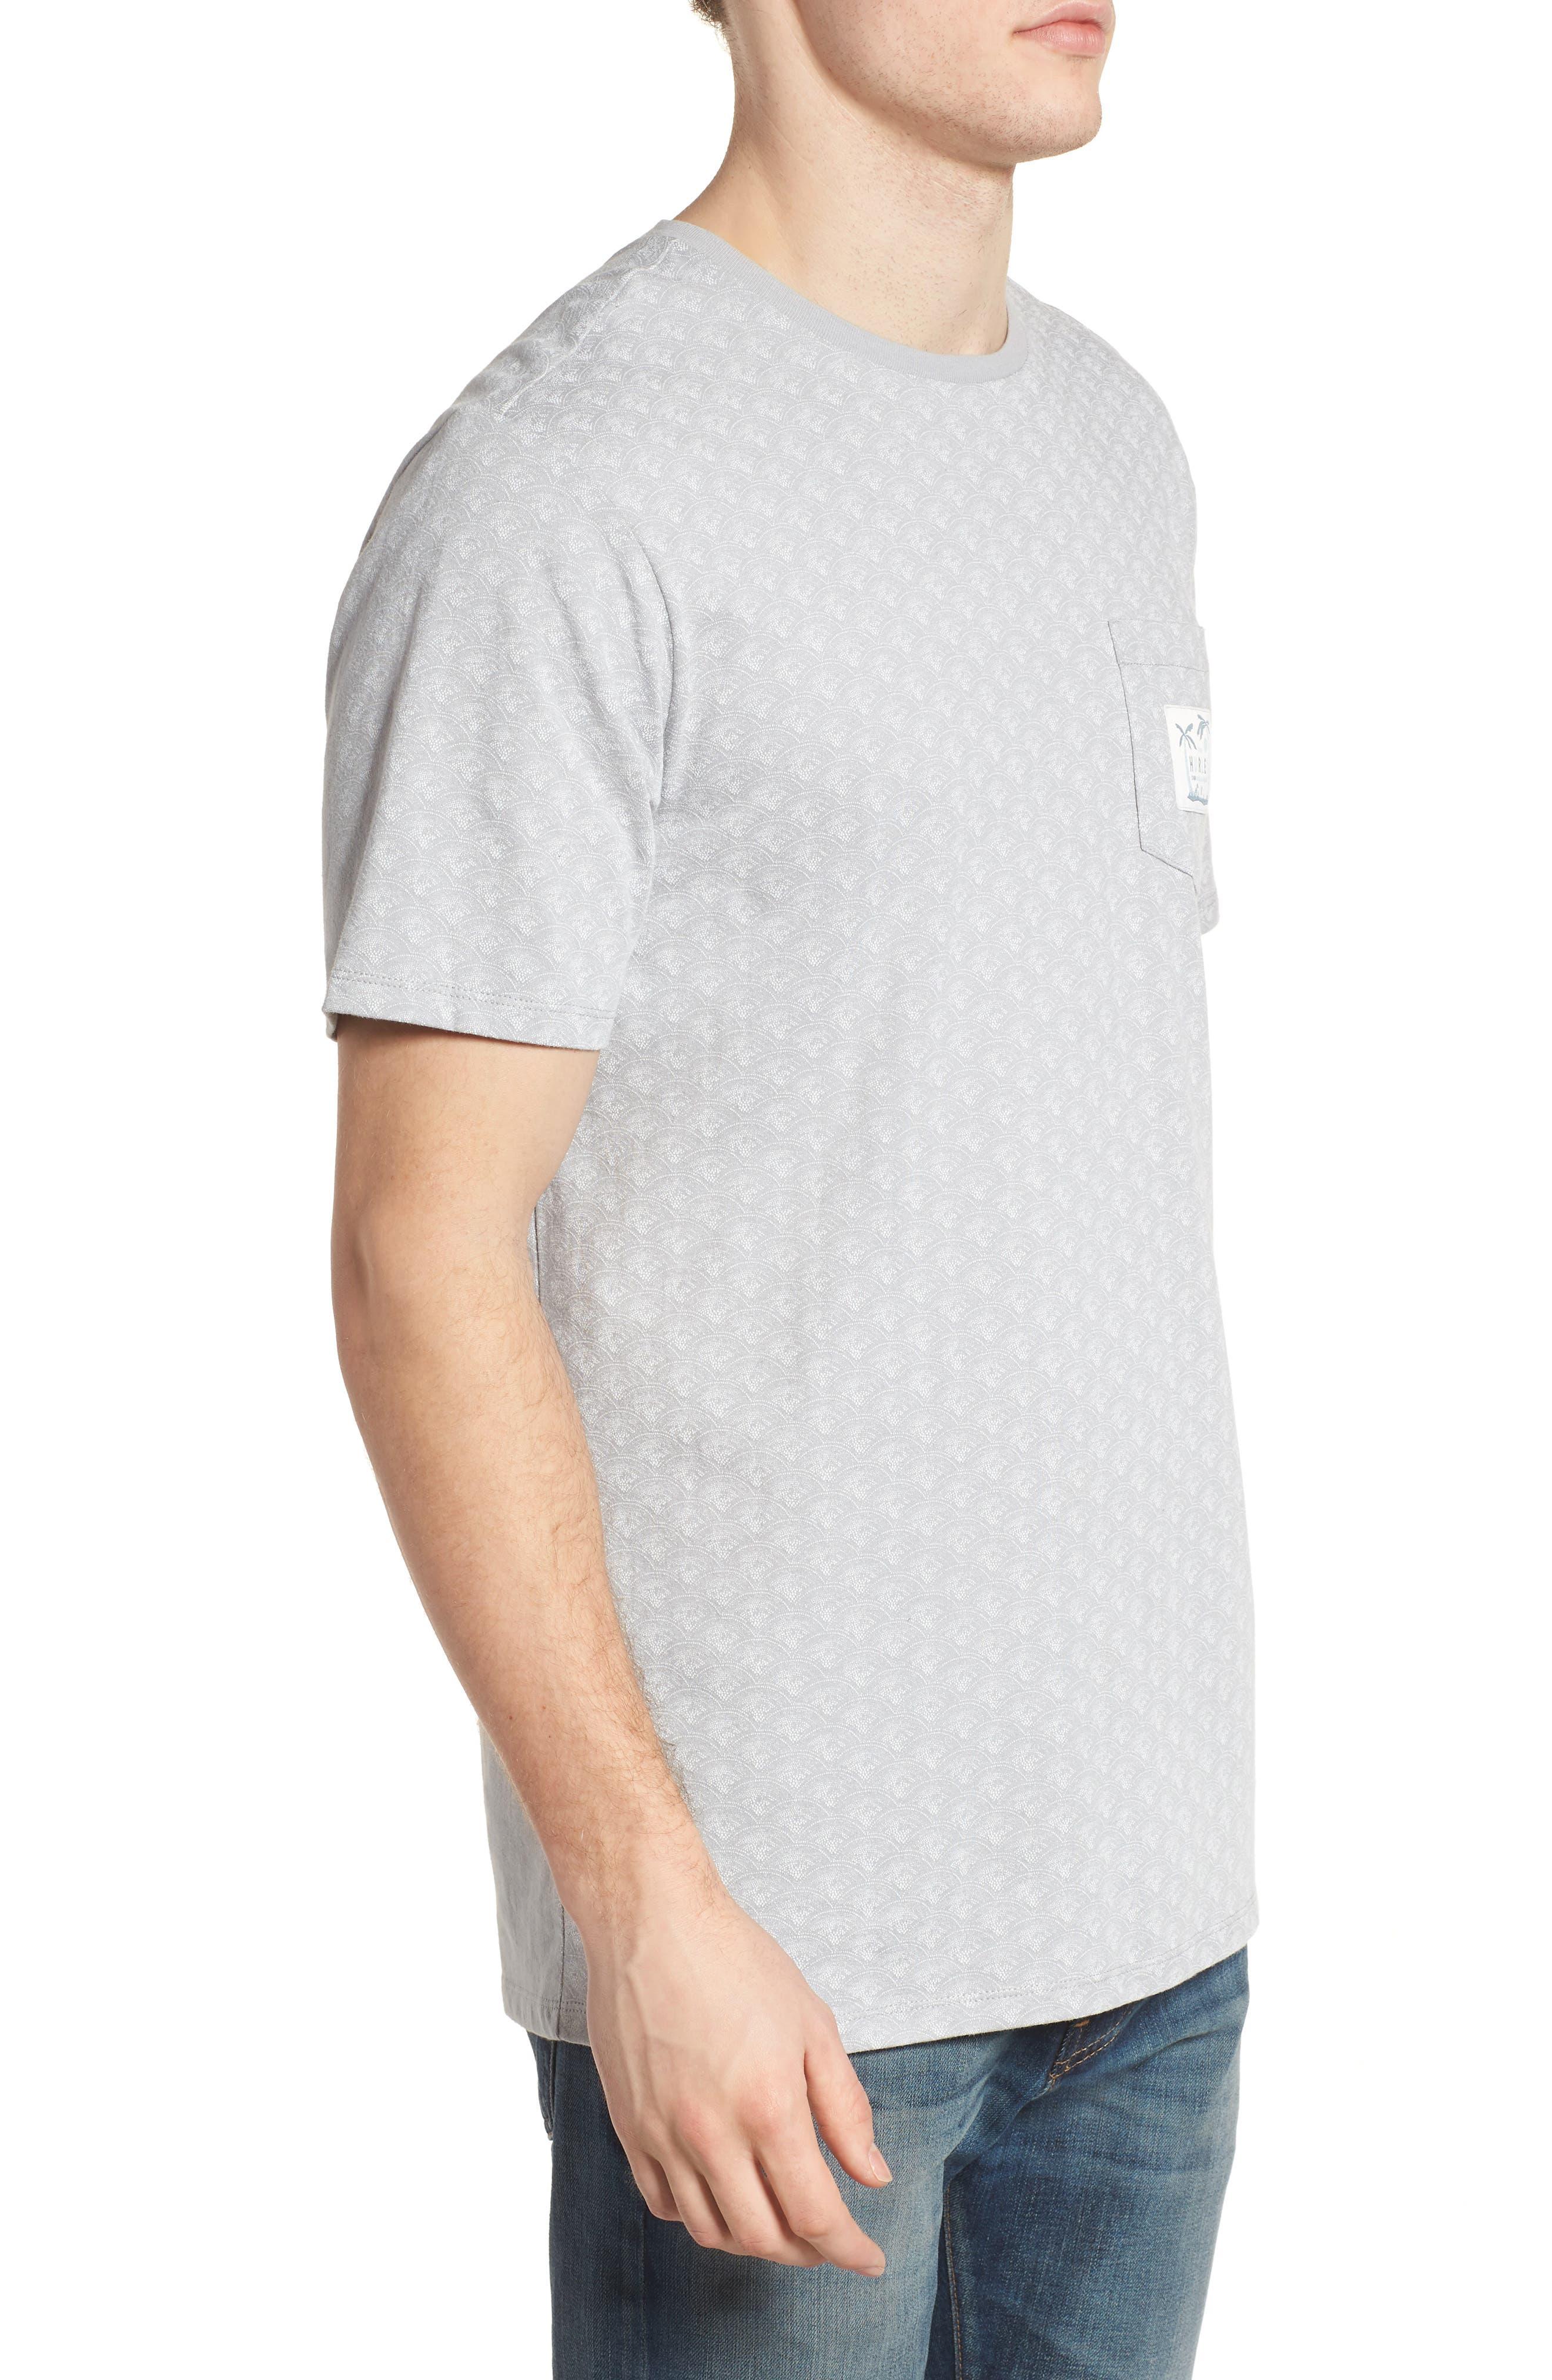 Pescado Short Sleeve T-Shirt,                             Alternate thumbnail 3, color,                             133